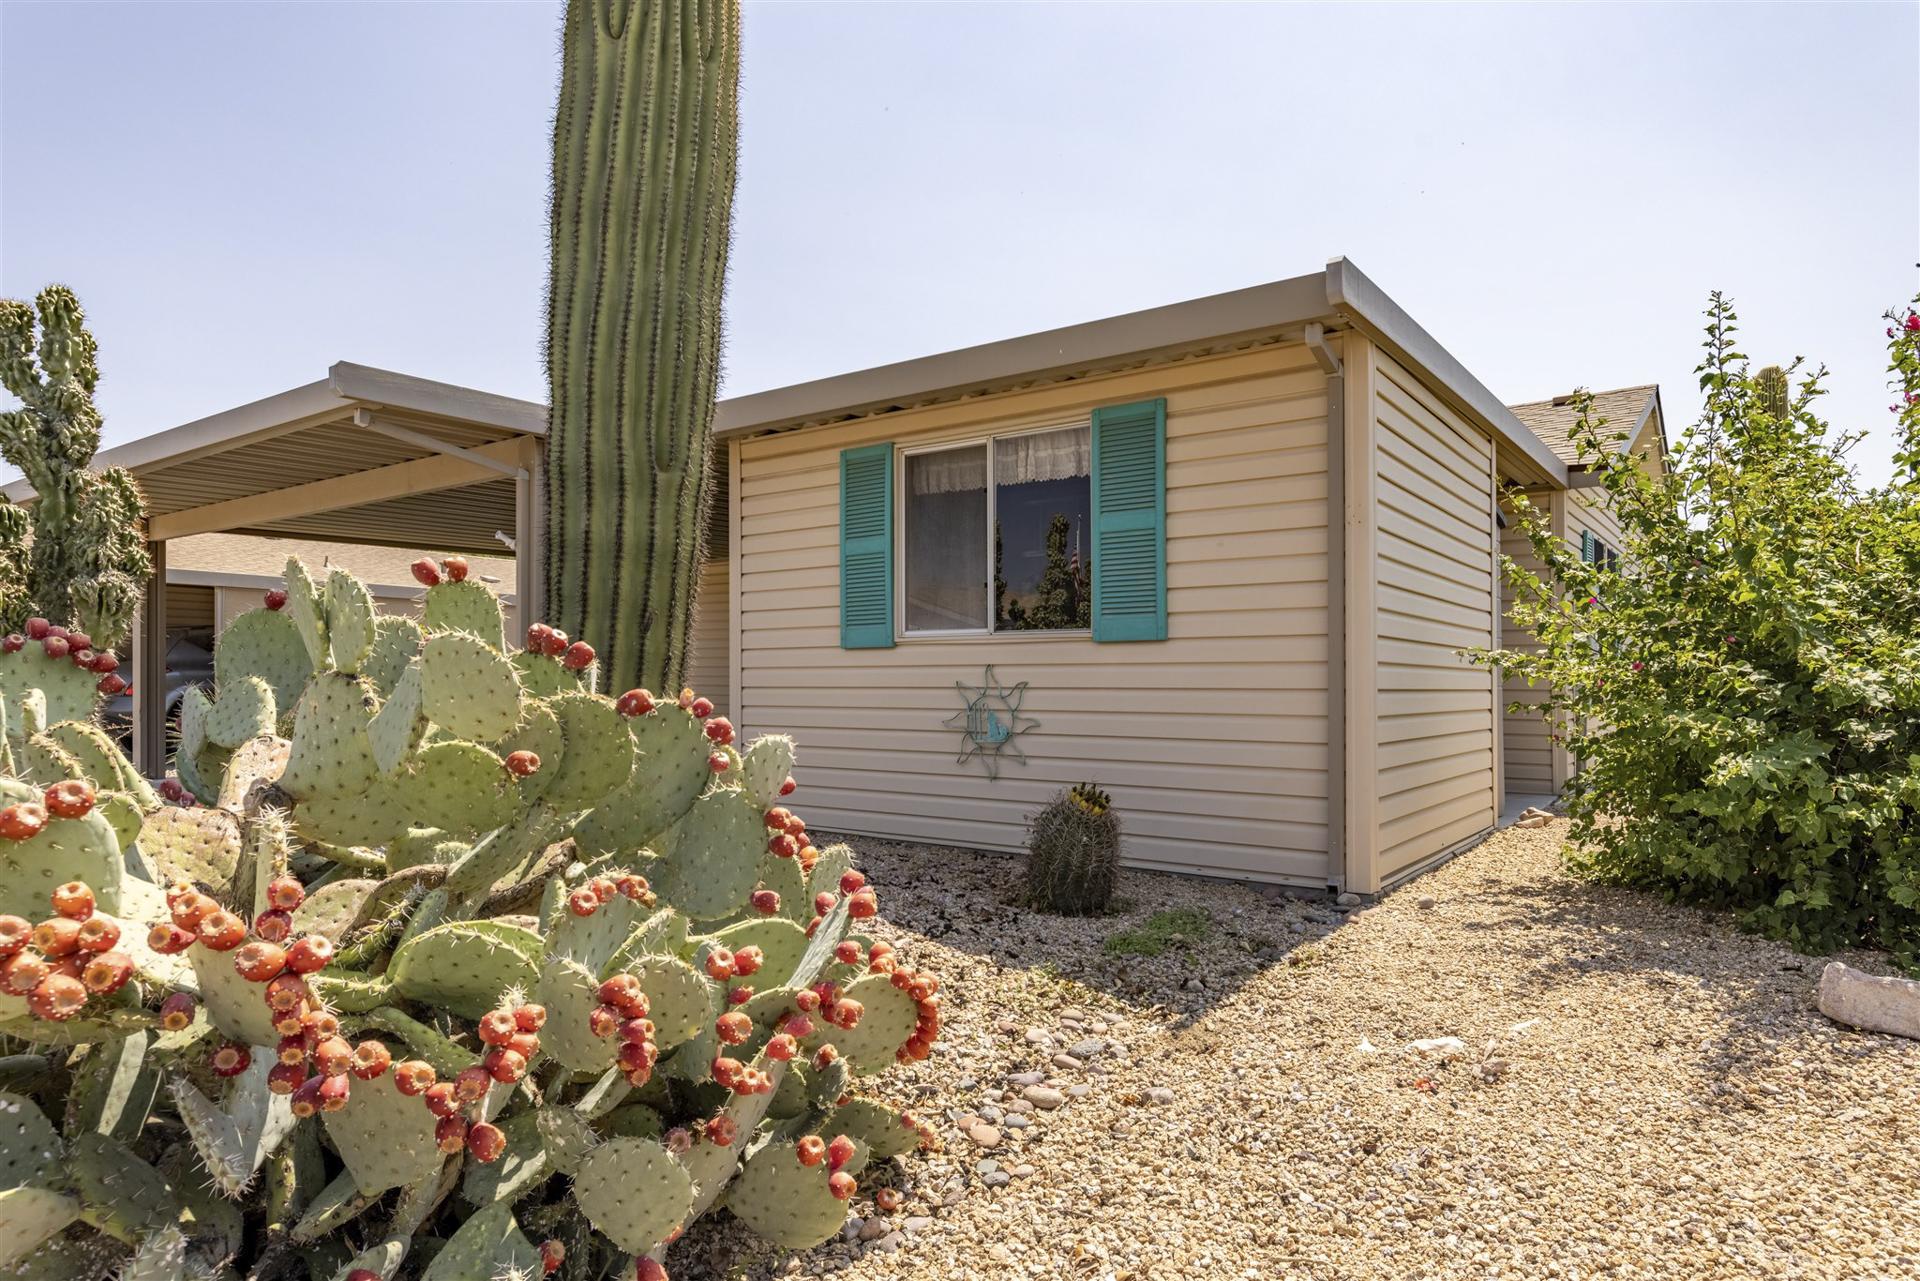 ON THE MARKET - 3301 S Goldfield RD, #1074, Apache Junction, AZ 85119 - Dolce Vita | Amy Jones Group